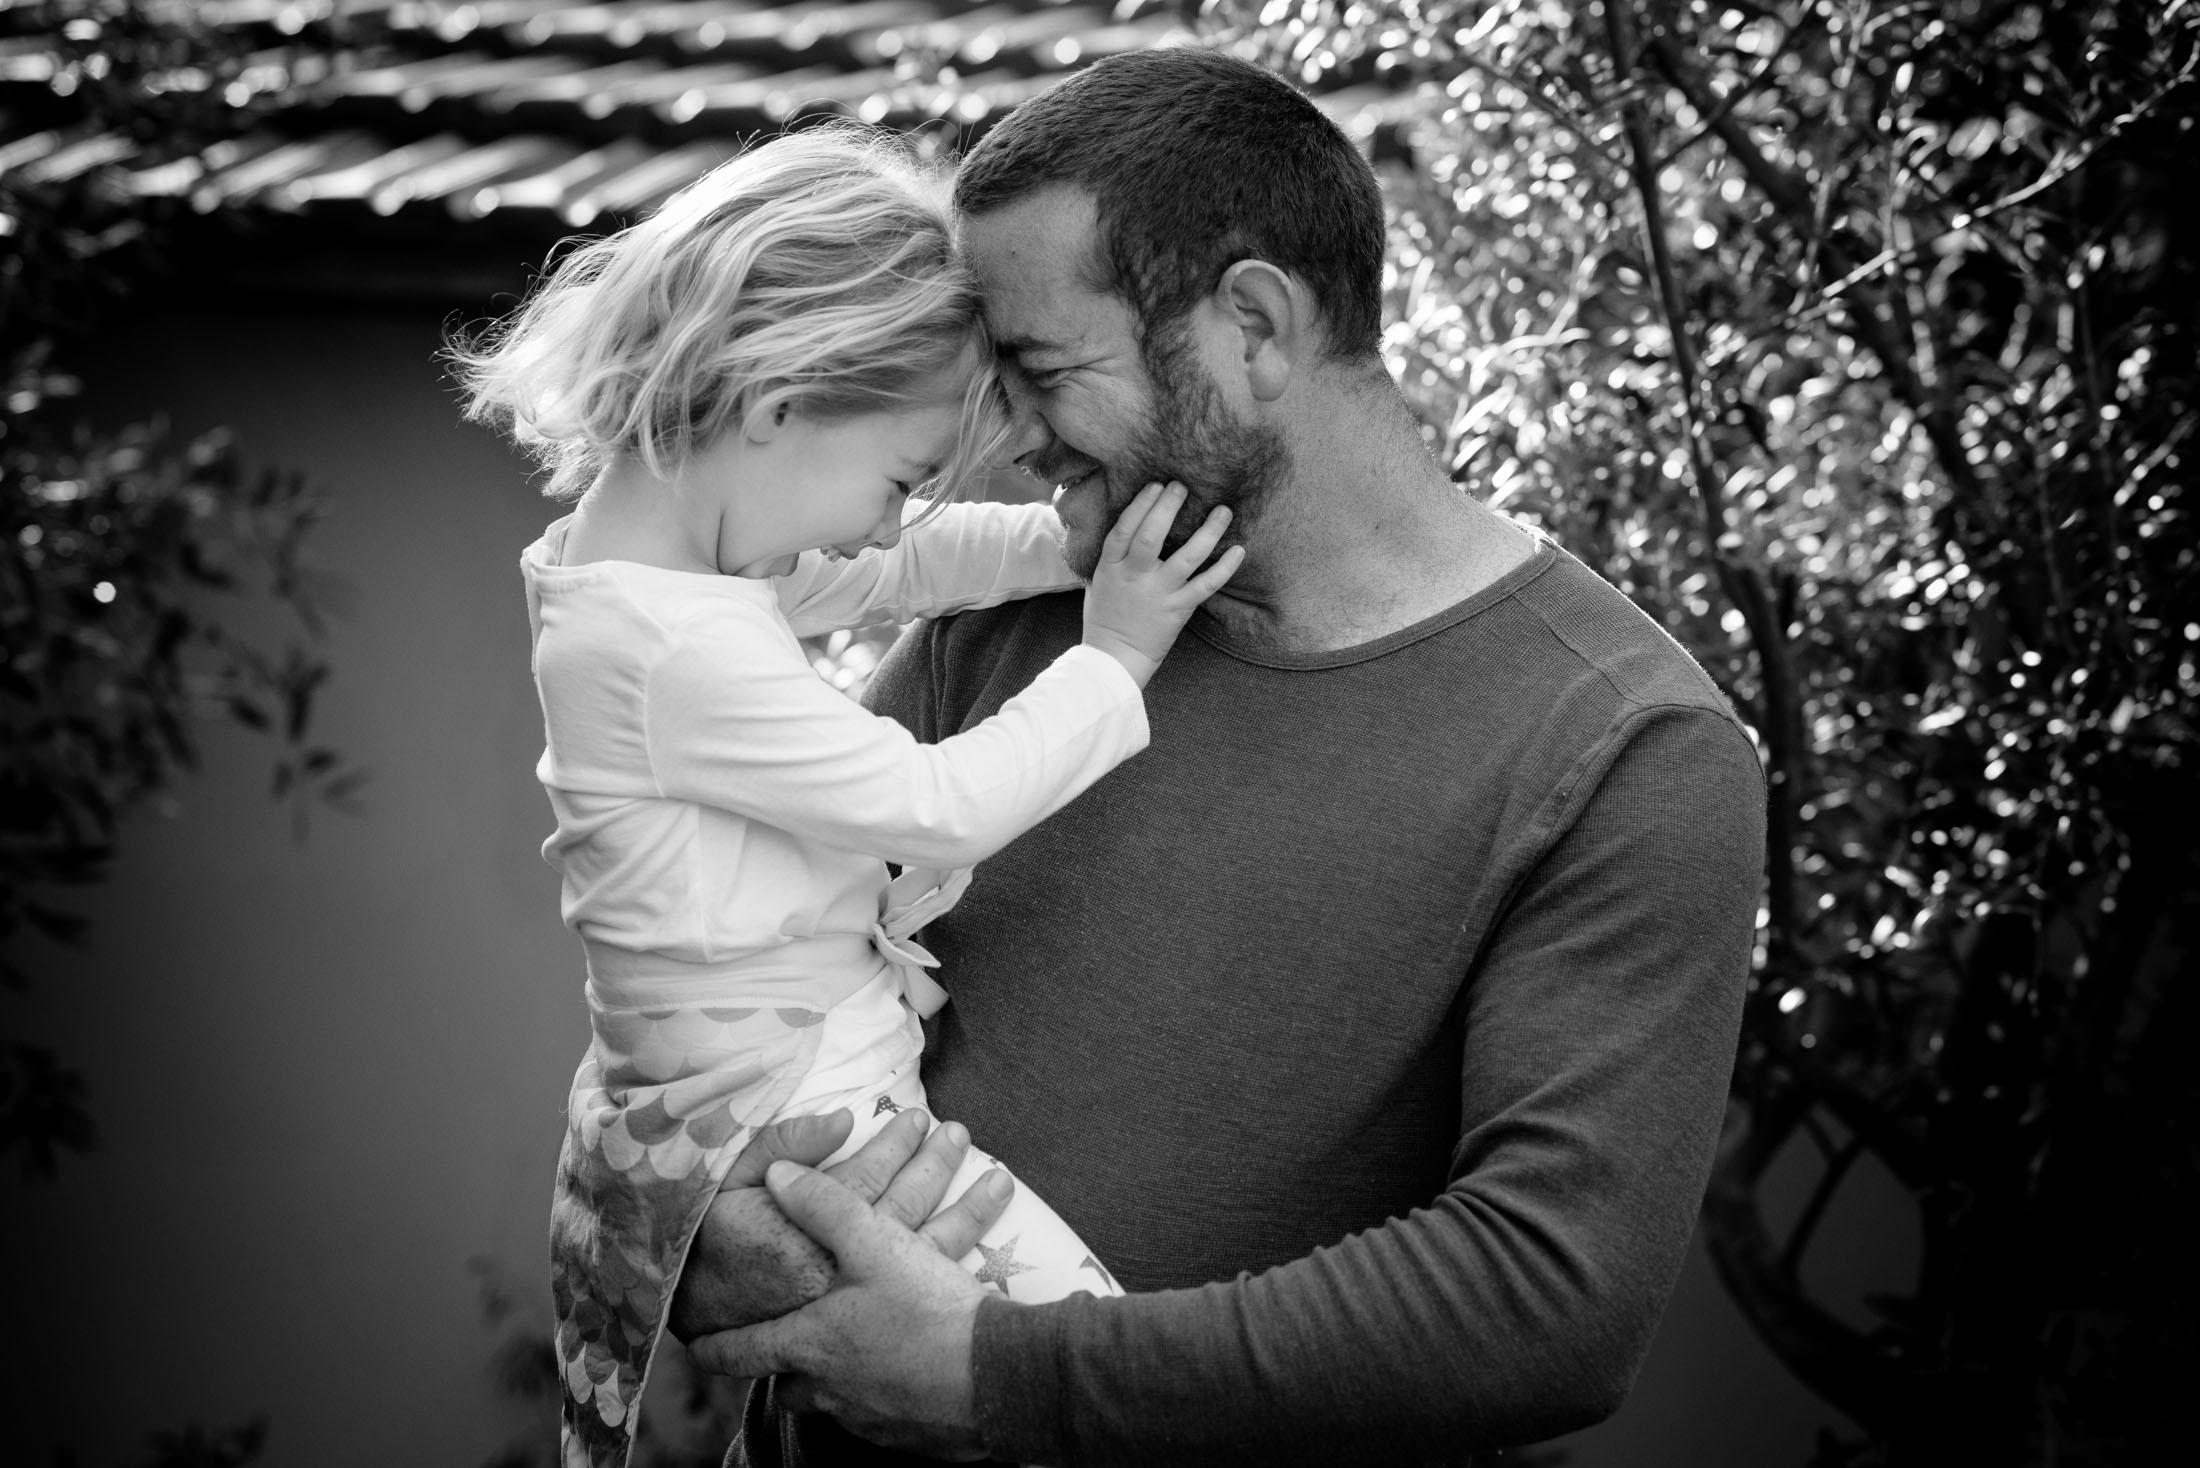 Laing_Family-Photography-unposed15.JPG